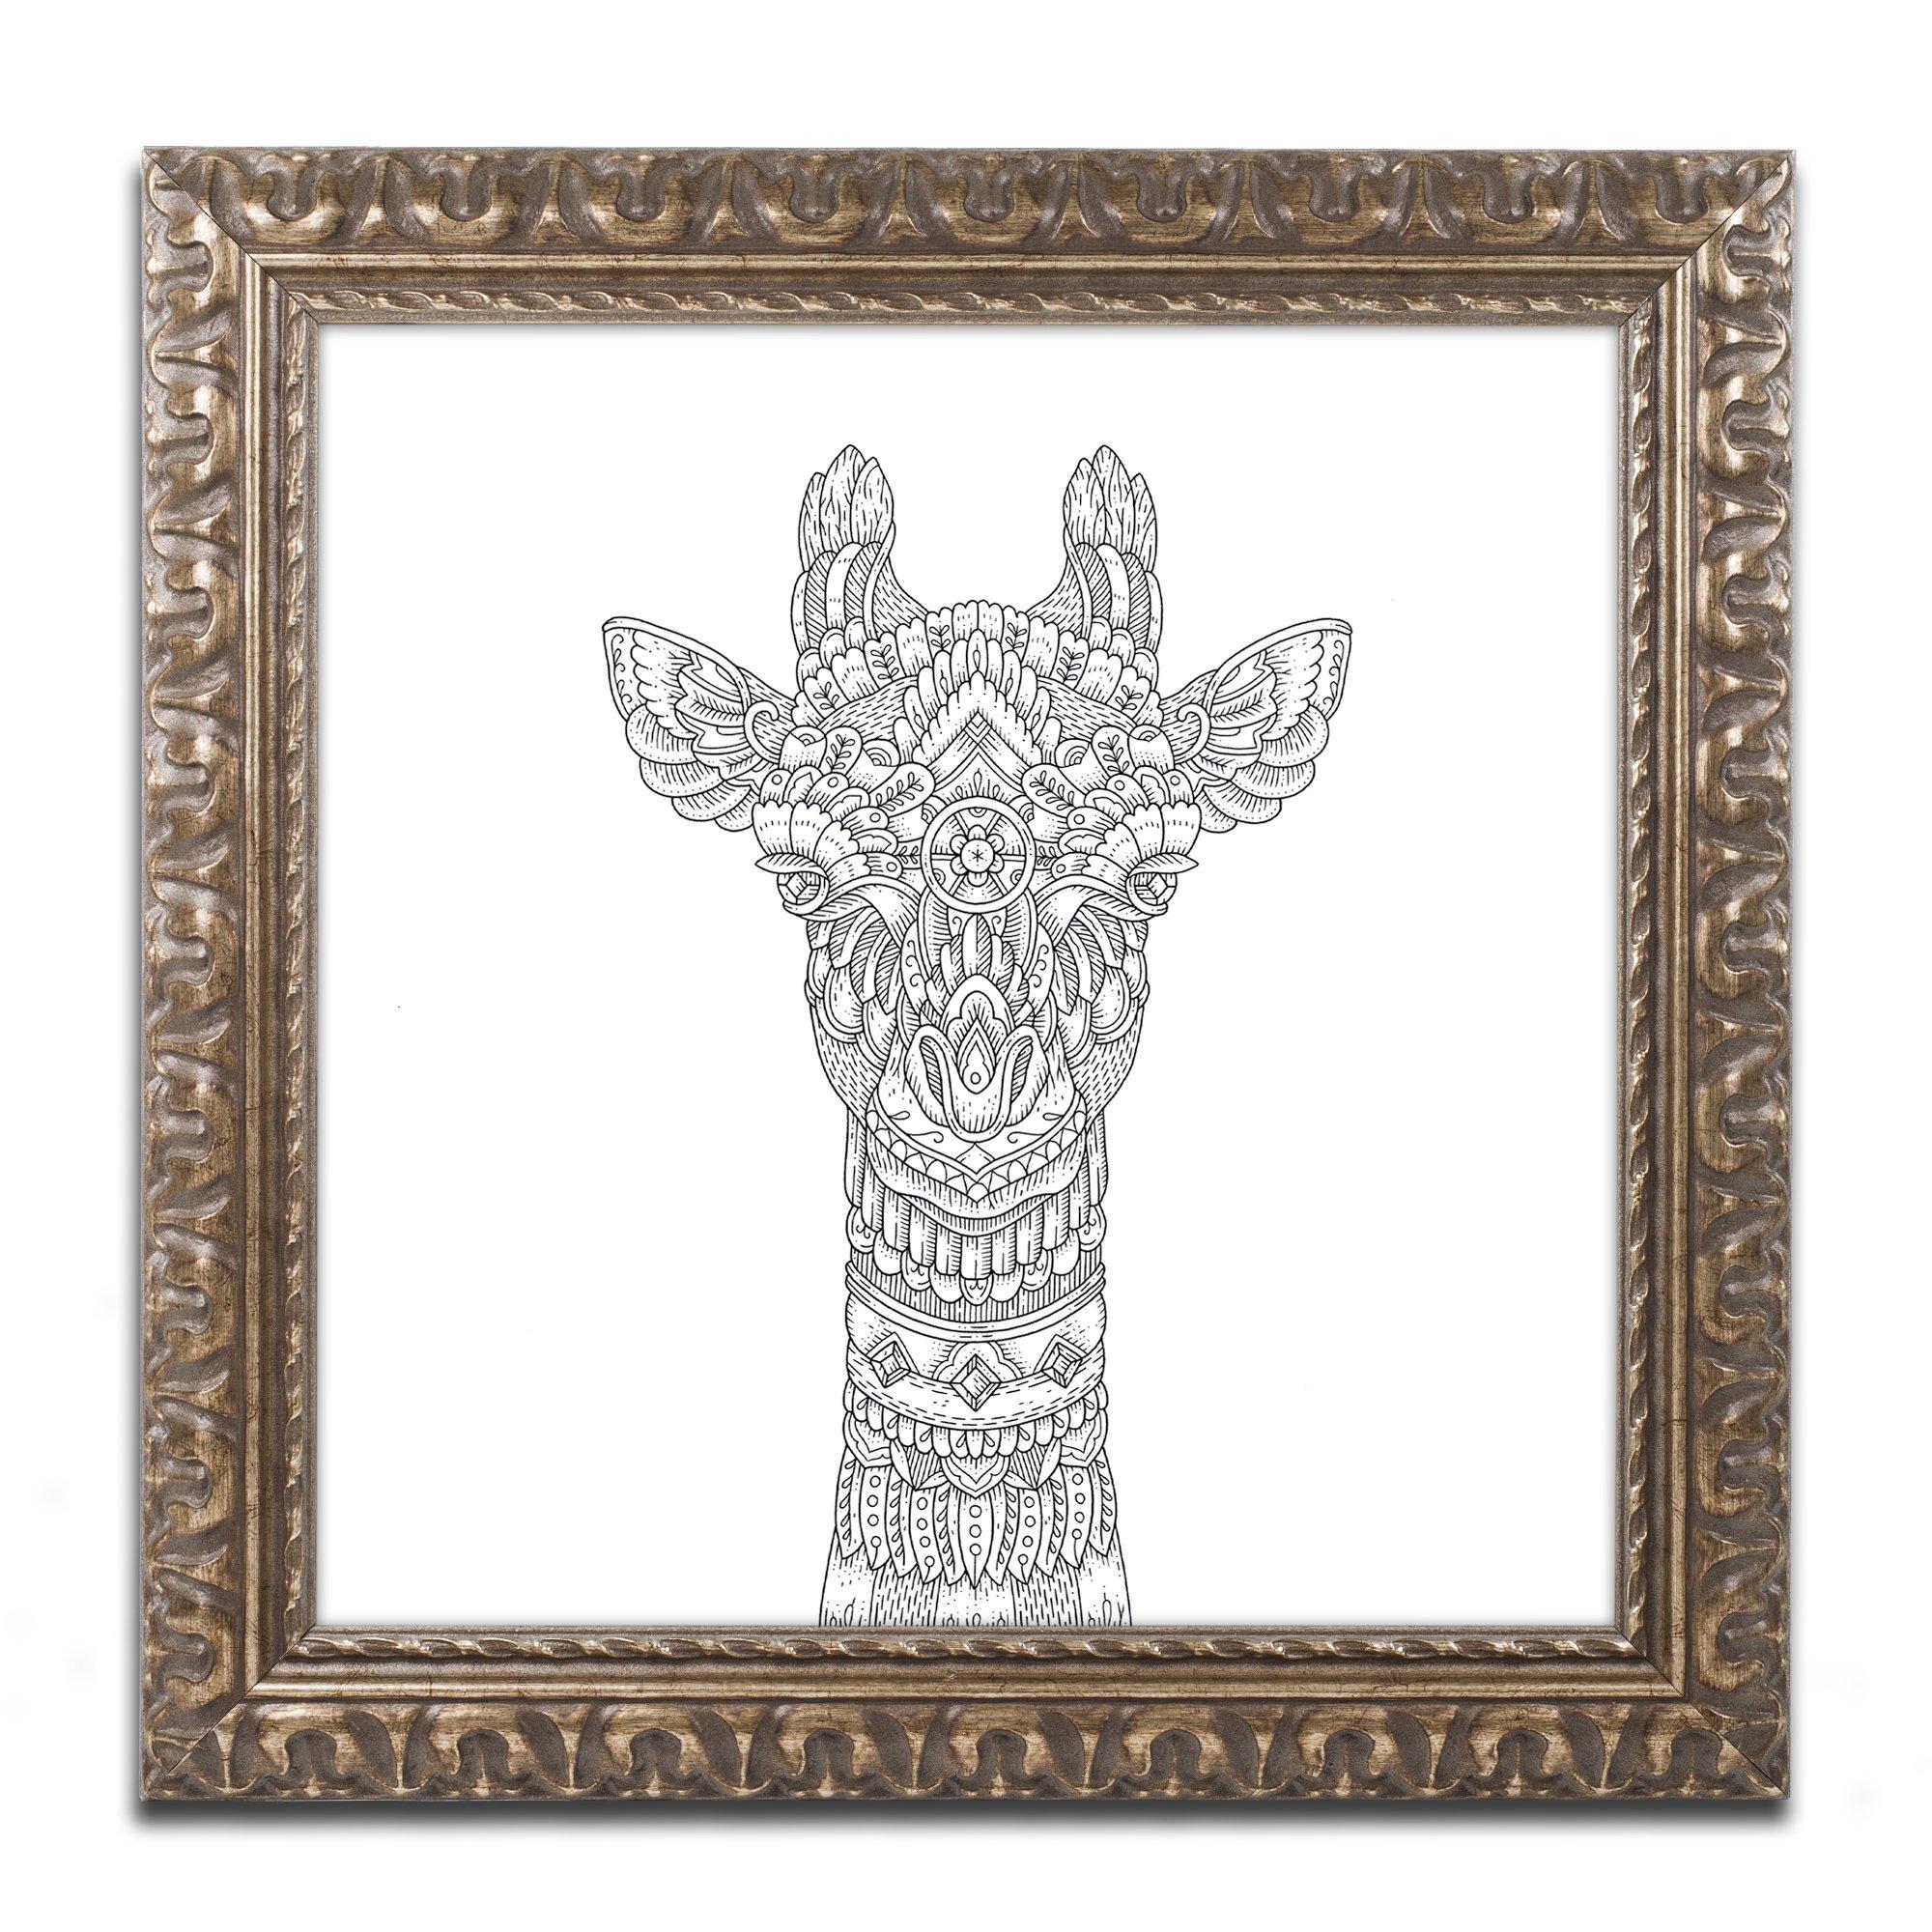 Giraffe PhotoINC Studio Photograph Animal Africa Print Poster 32x32